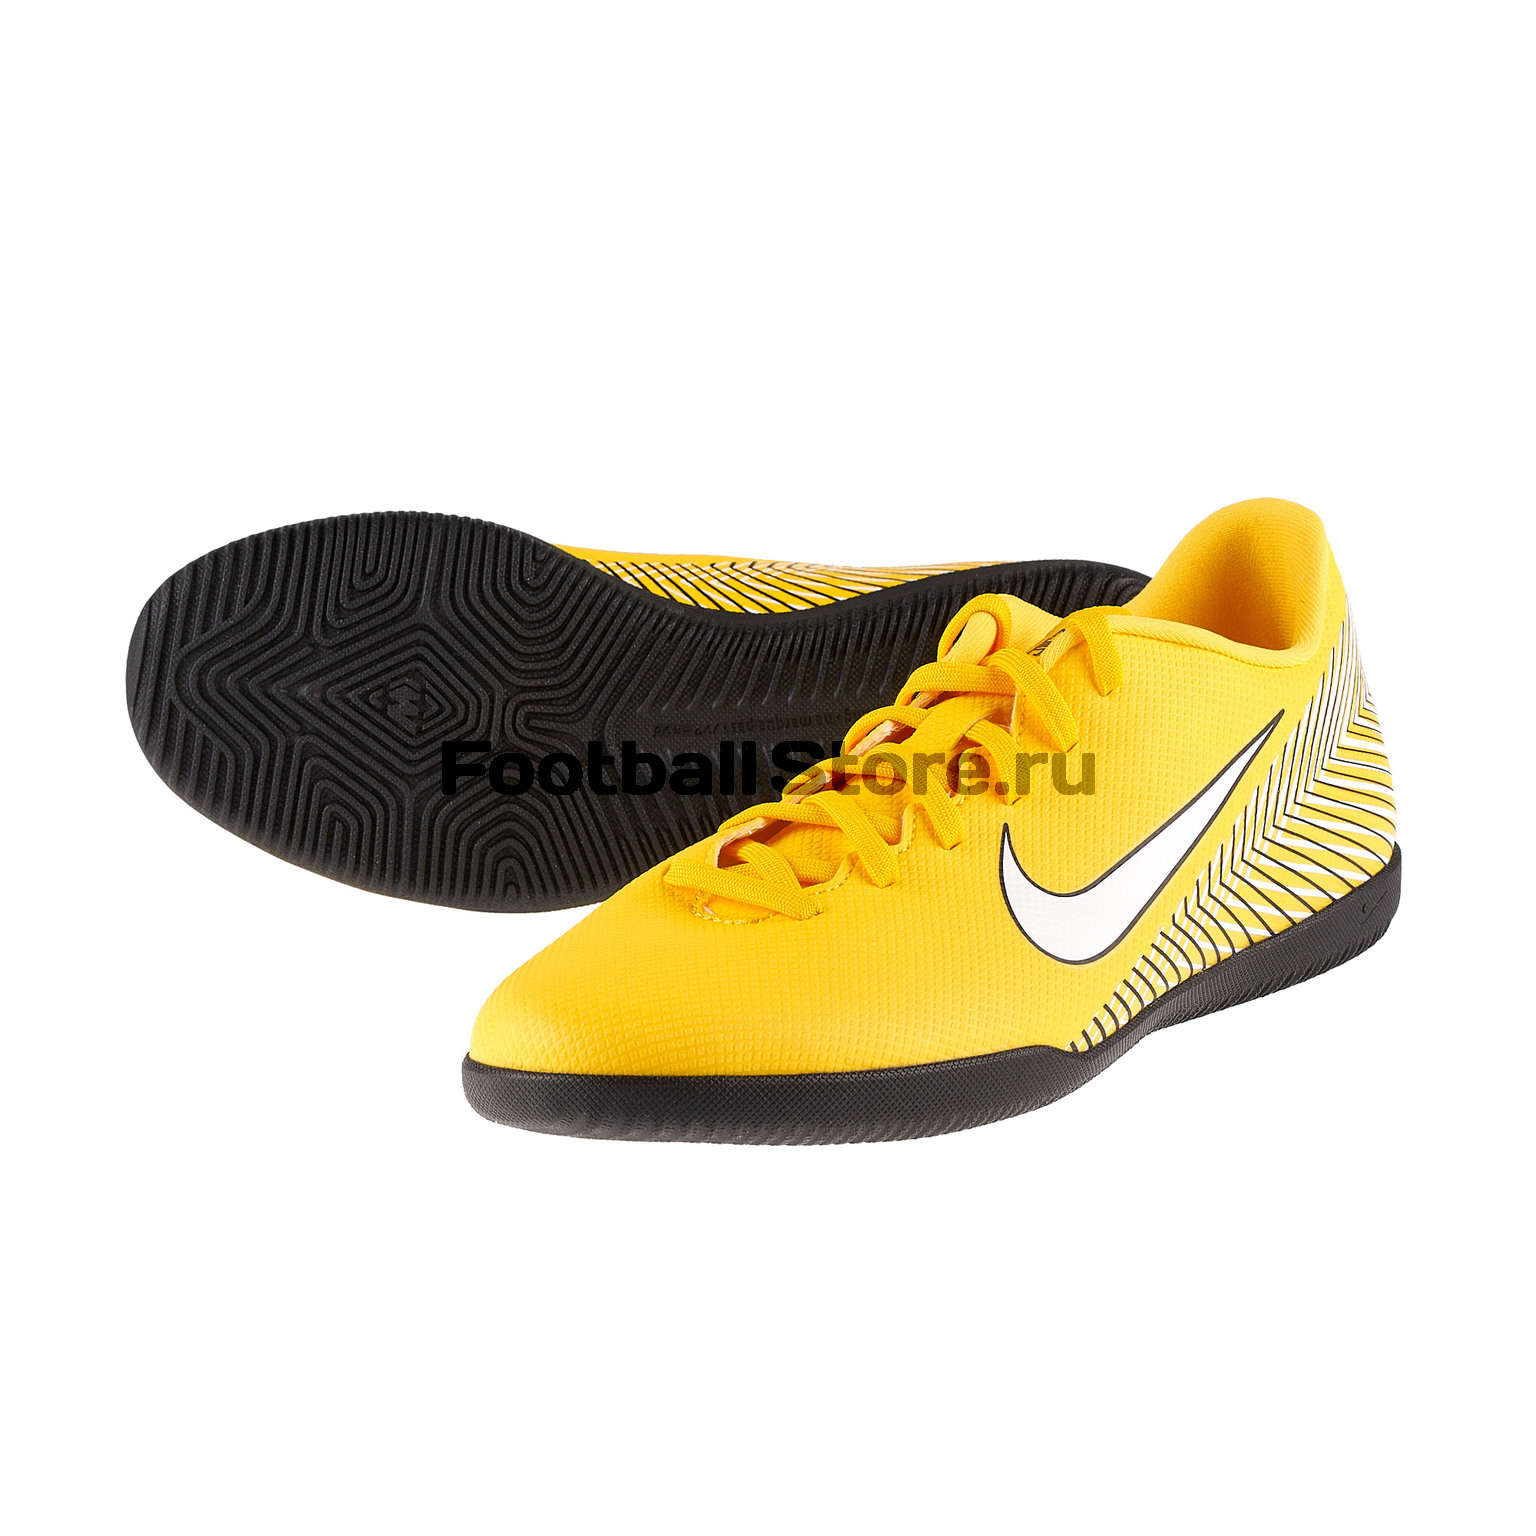 Обувь для зала NIike Vapor 12 Club Neymar IC AO3120-710